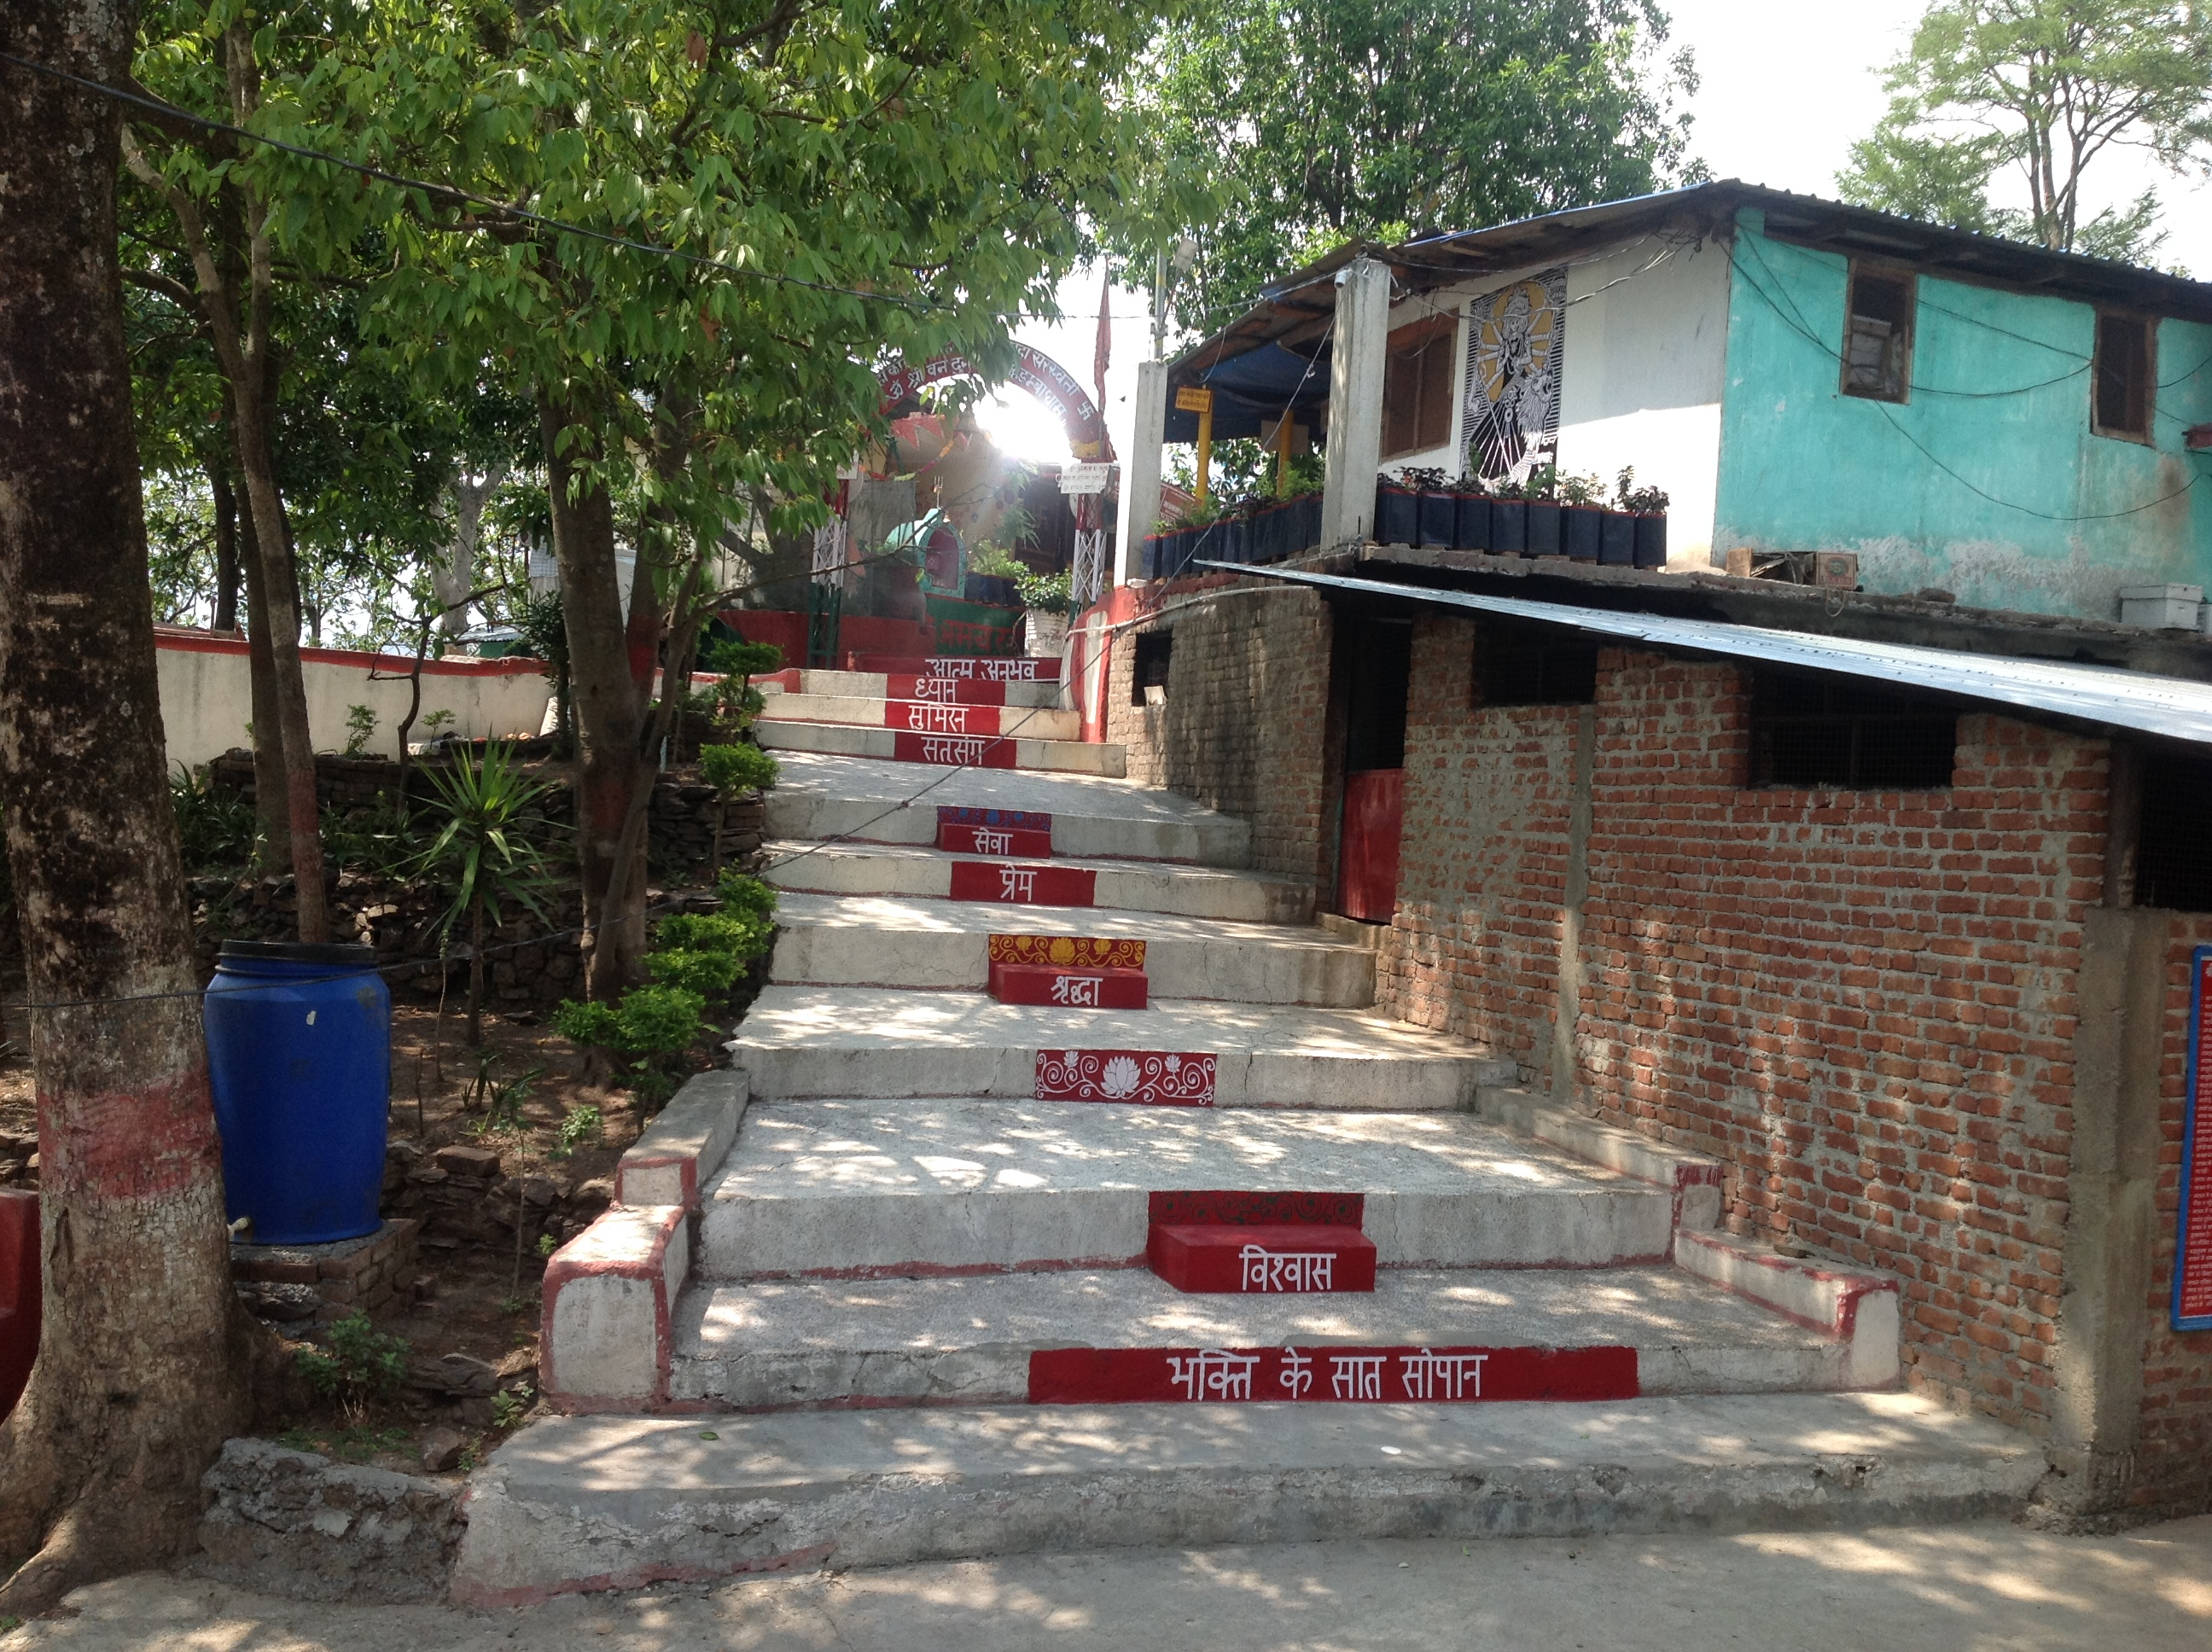 Семь шагов бхакти